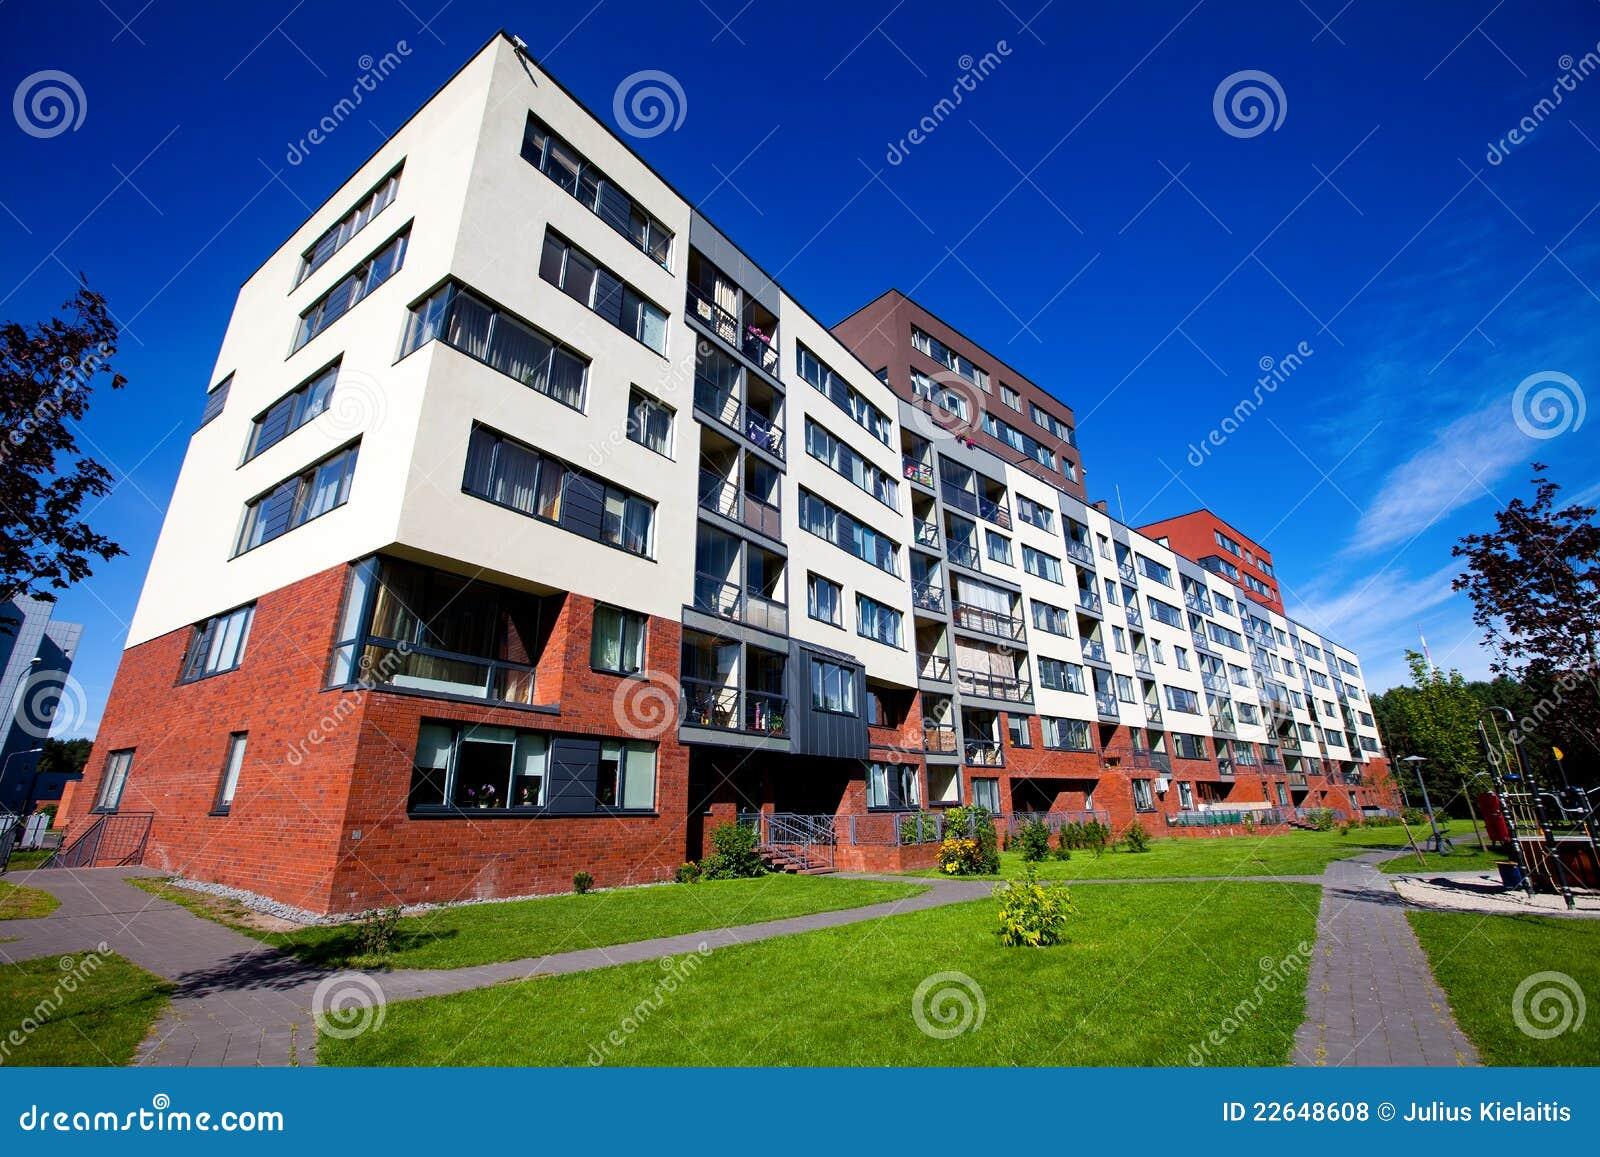 Immeuble moderne et neuf photos libres de droits image for Image immeuble moderne